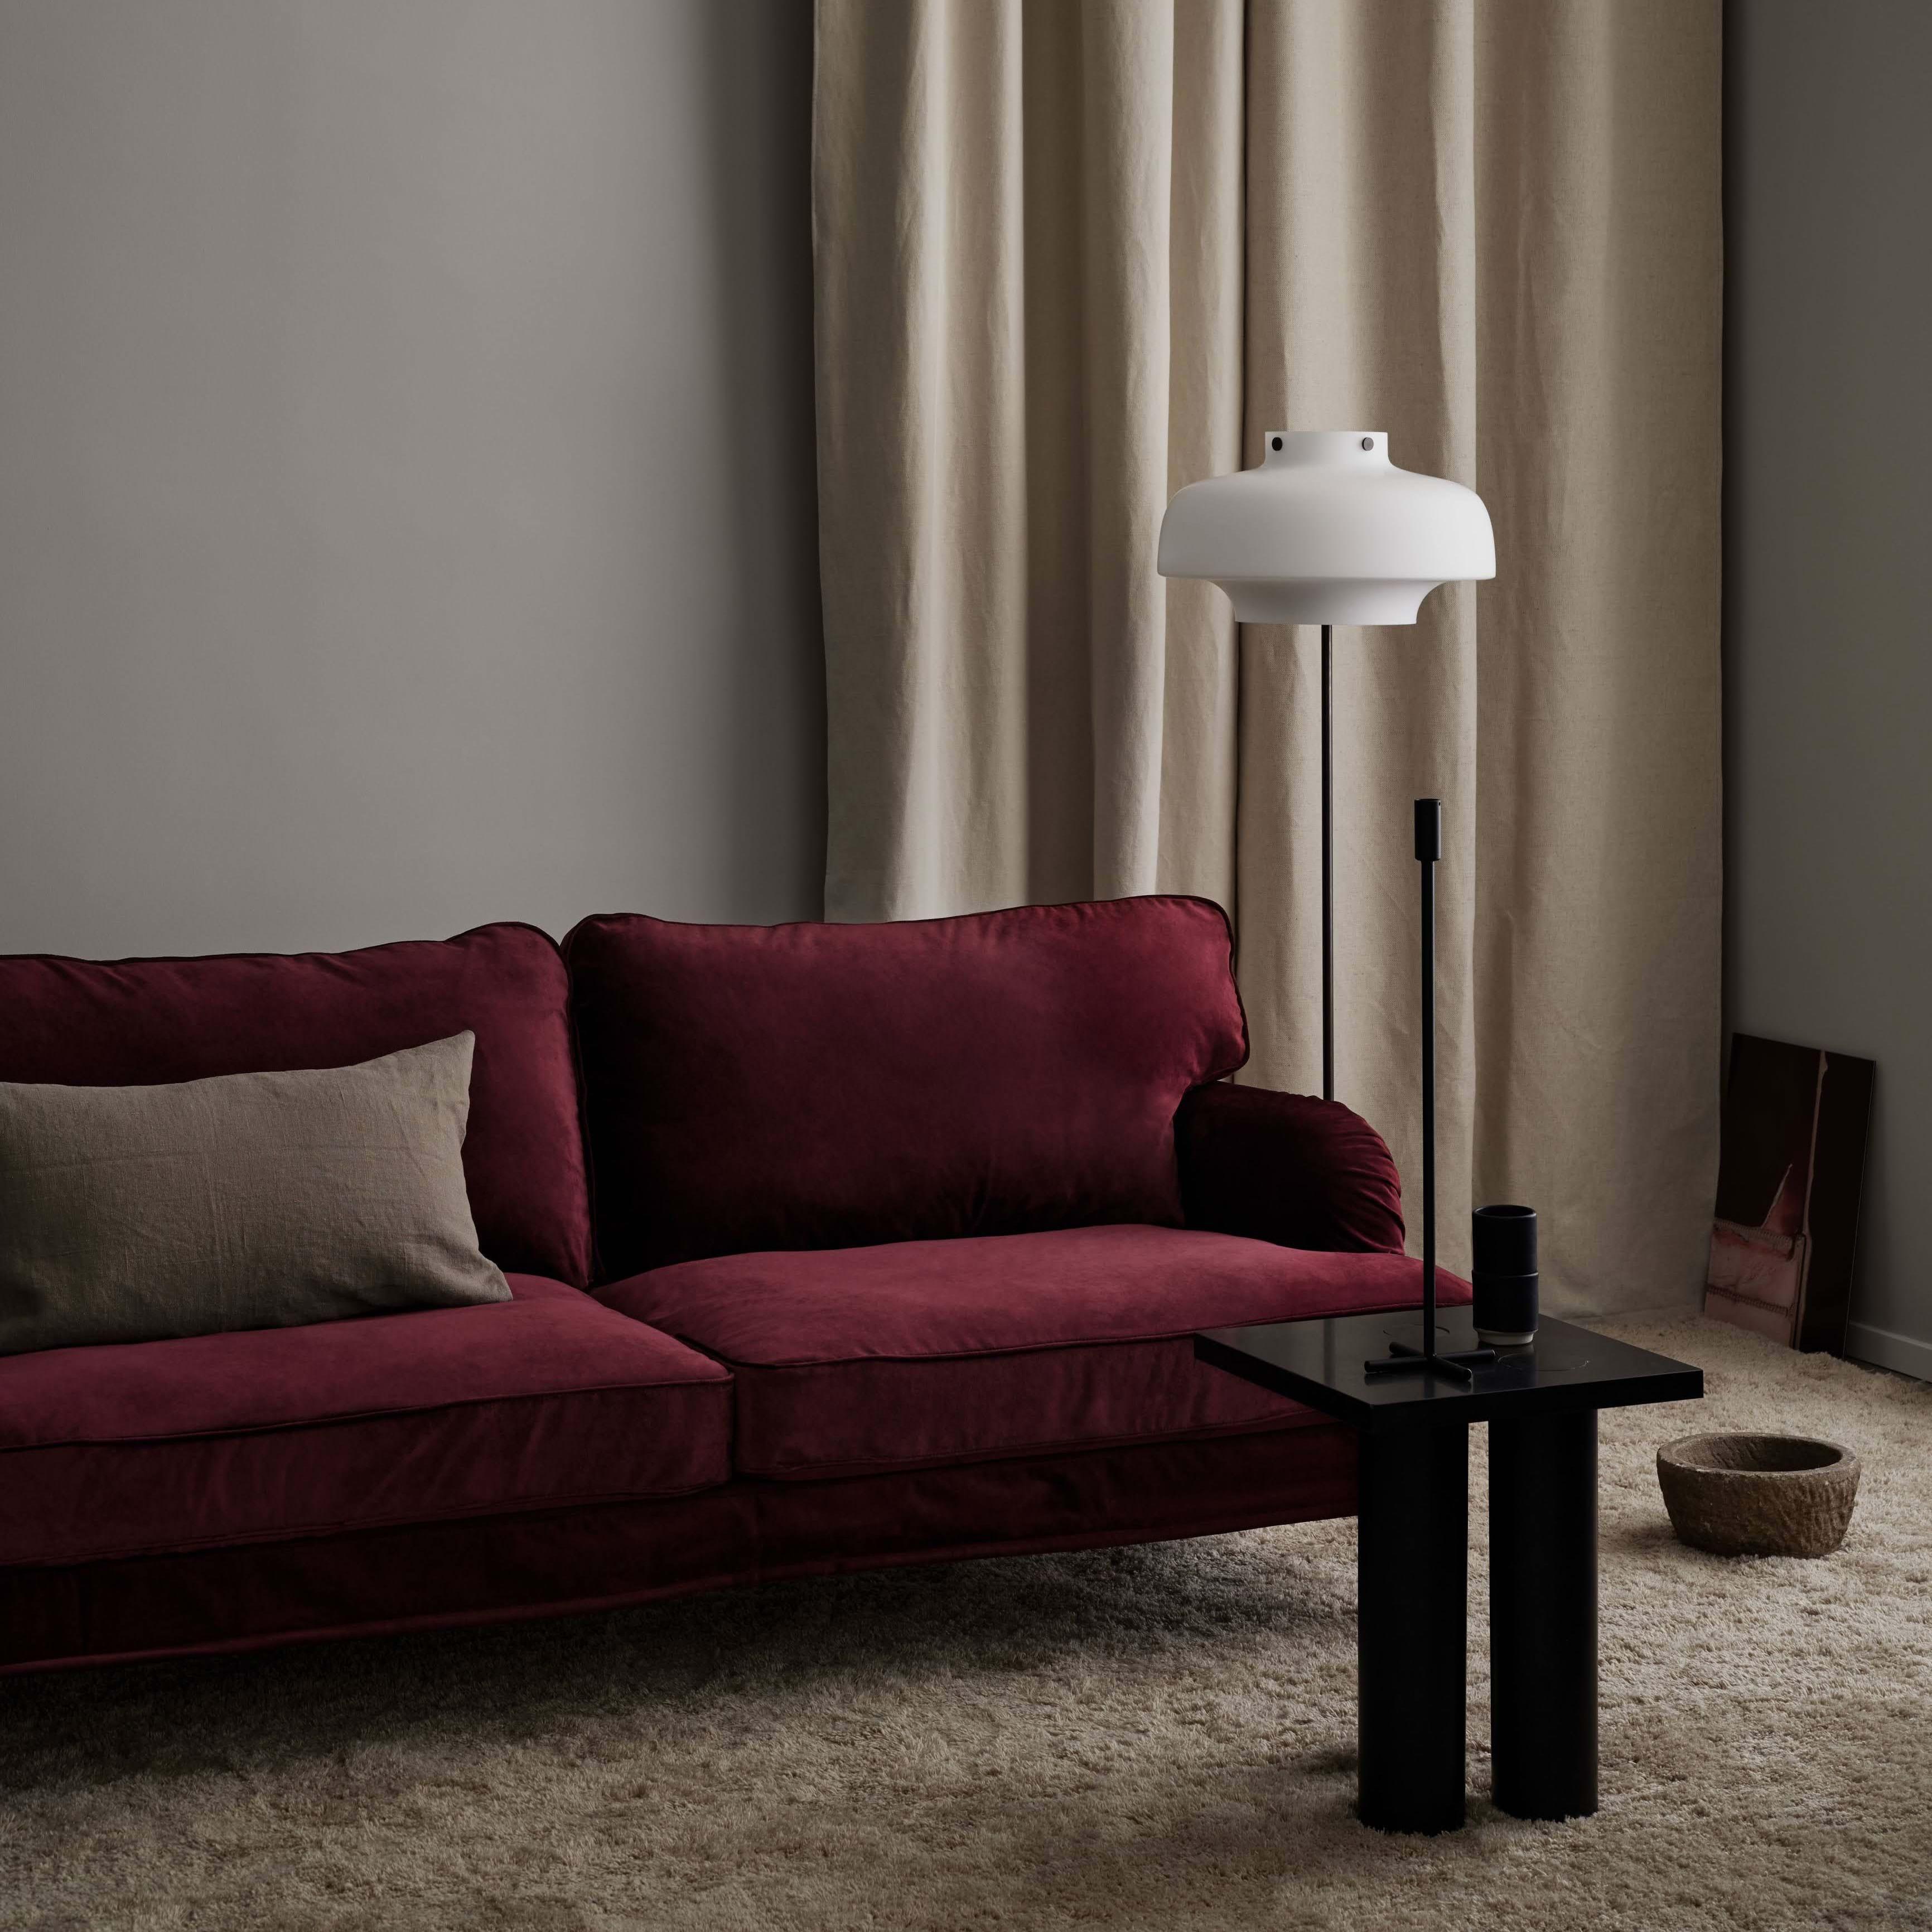 Superb Custom Covers Slipcovers For Ikea Sofas Armchairs Creativecarmelina Interior Chair Design Creativecarmelinacom